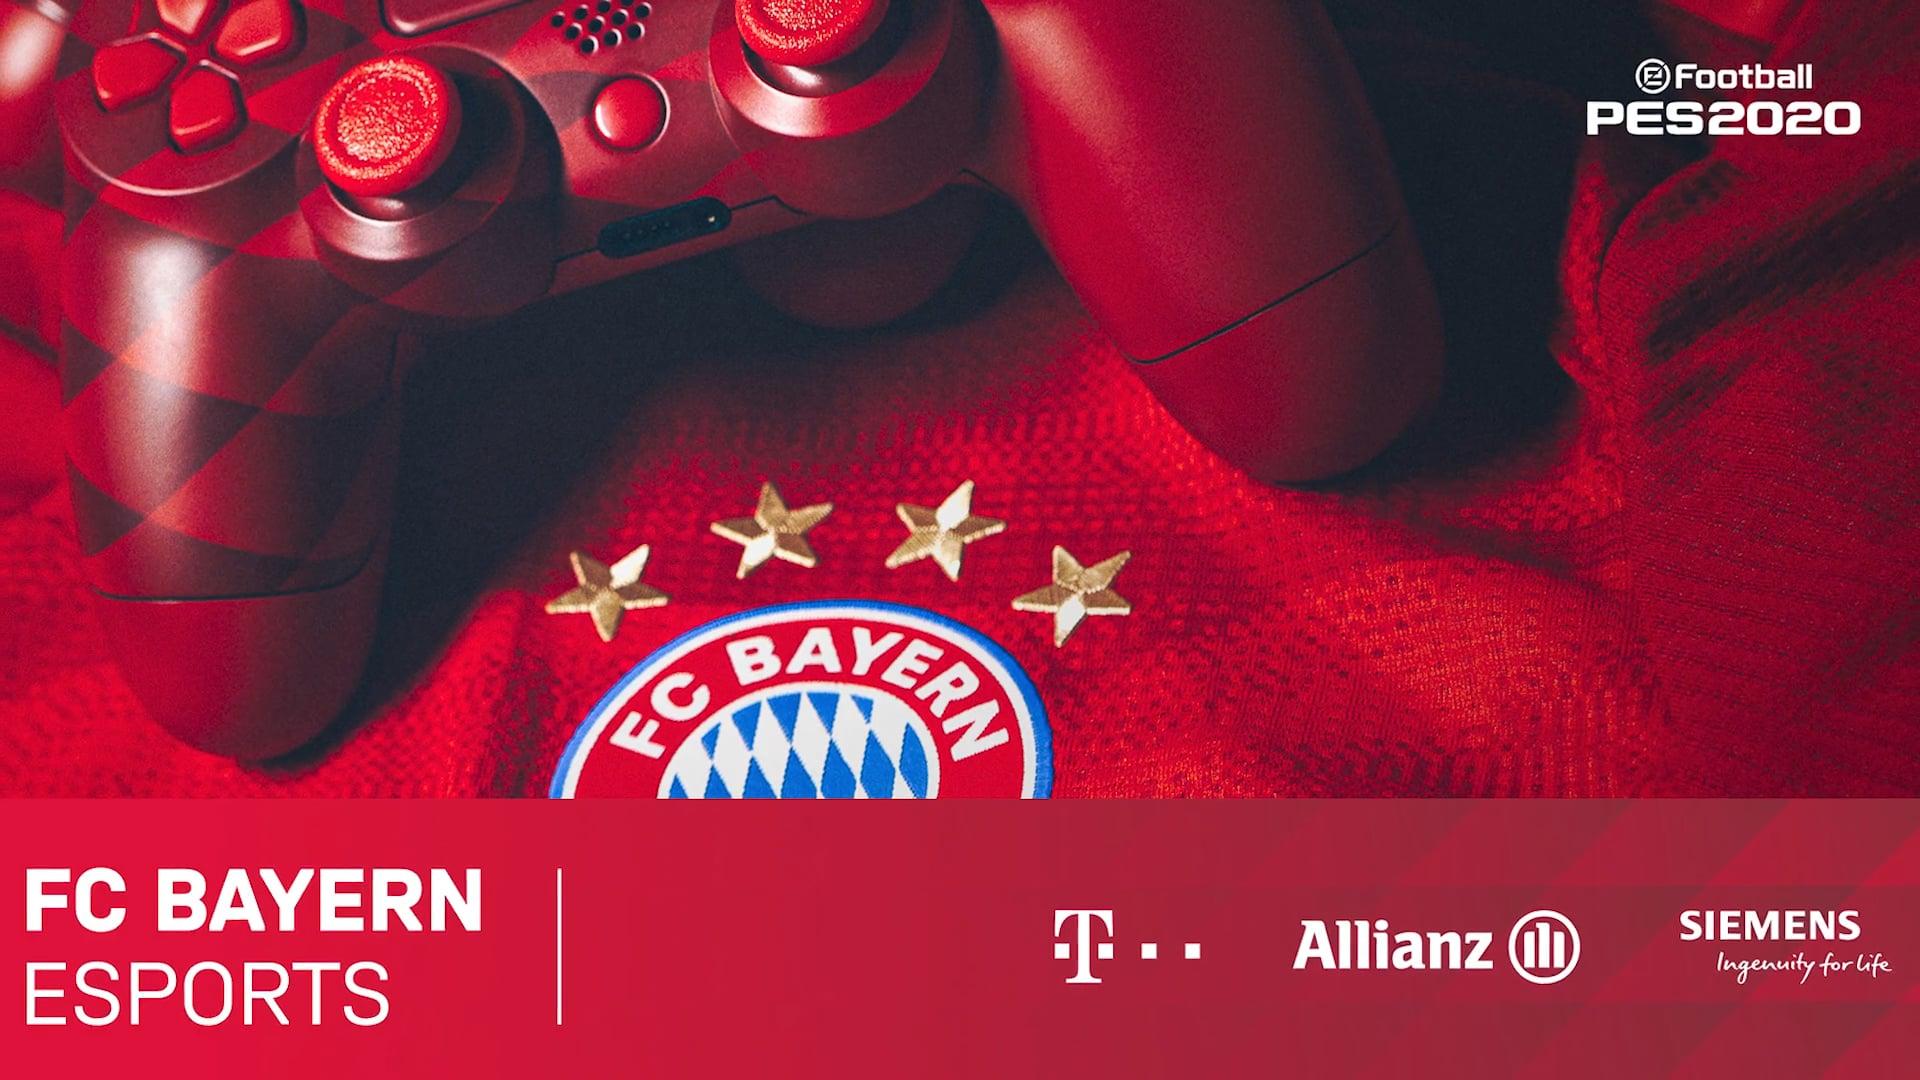 FC Bayern ESports - PES2020